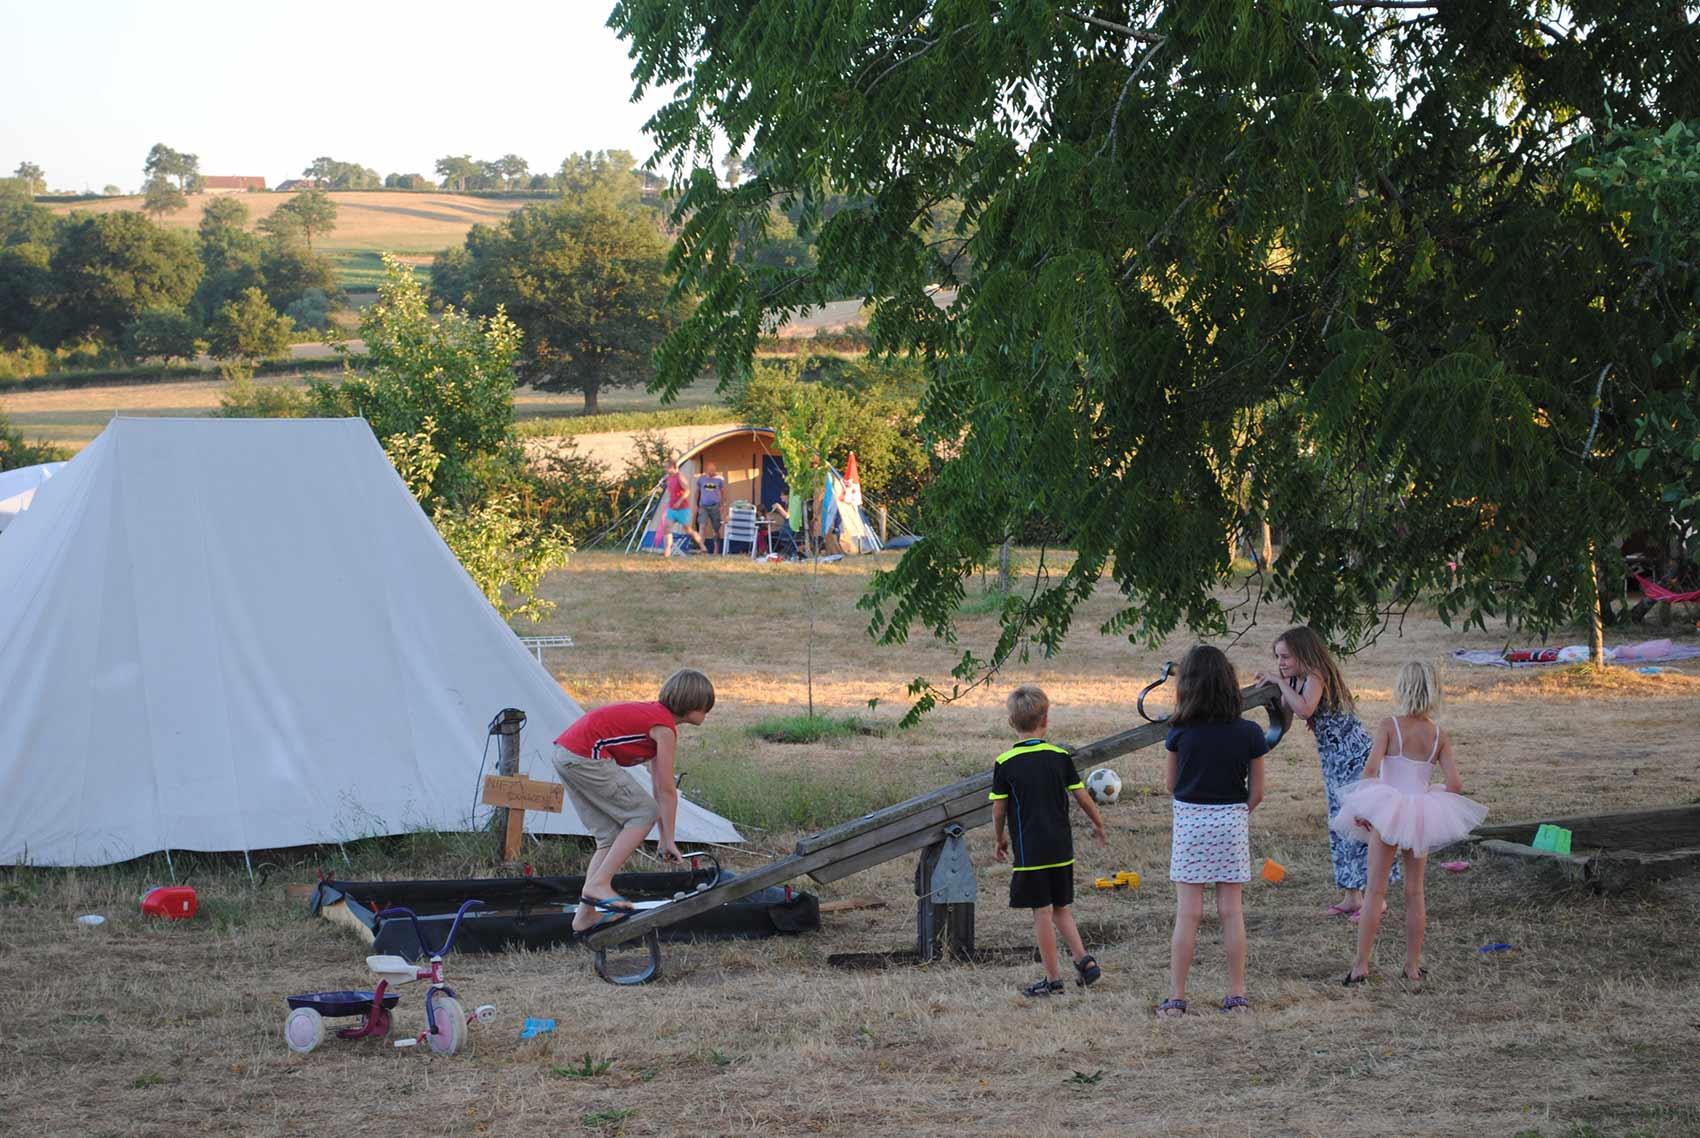 Kinderparadijs, speeltuin, Brénazet, Allier, Auvergne